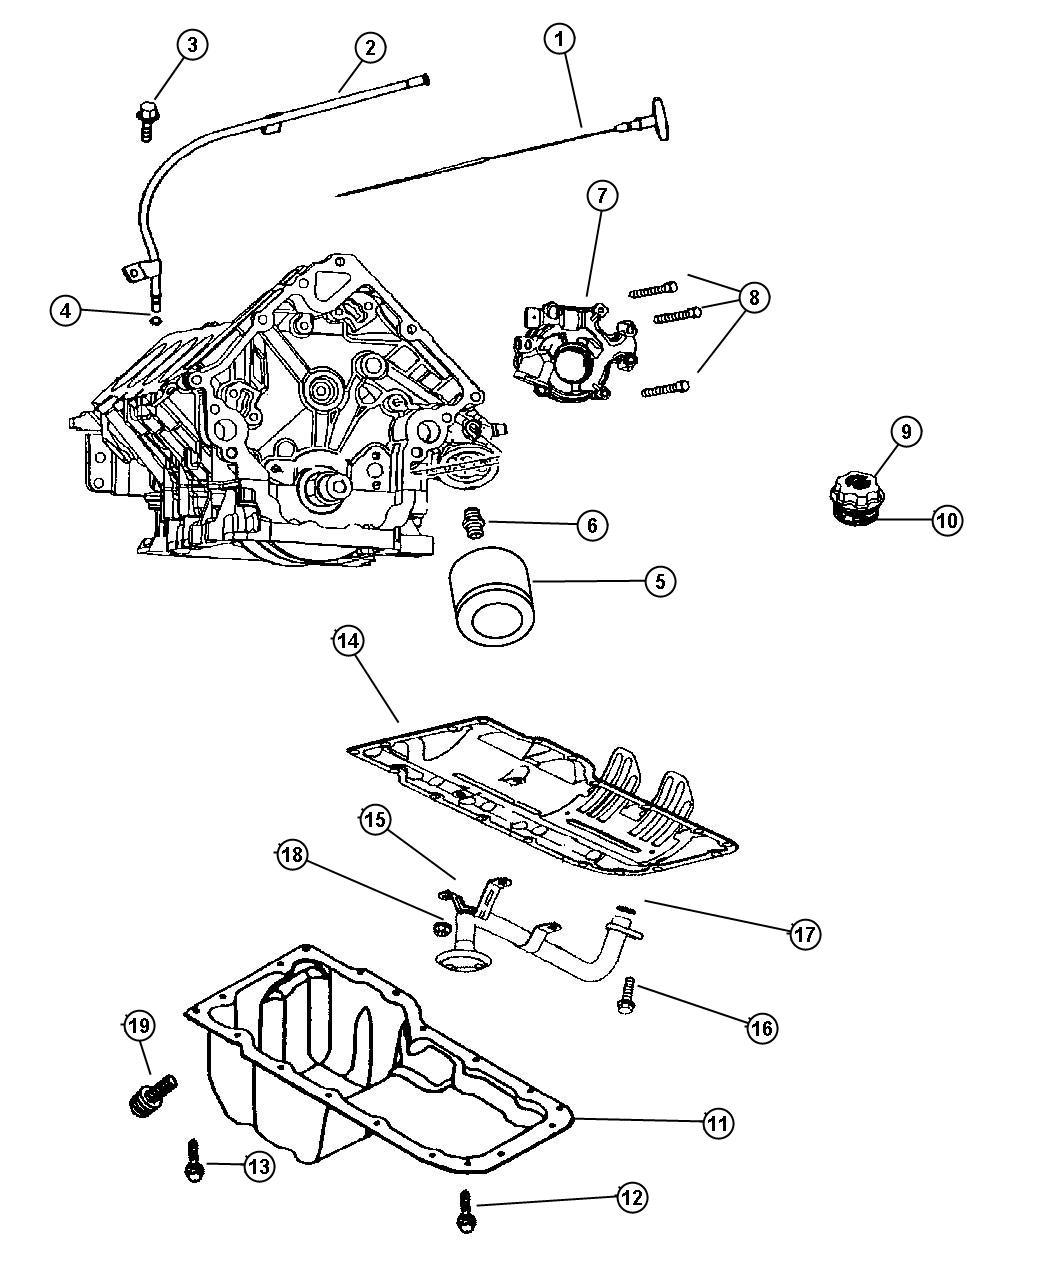 2007 Dodge Magnum Pan. Engine oil, oil. Mds, hemi